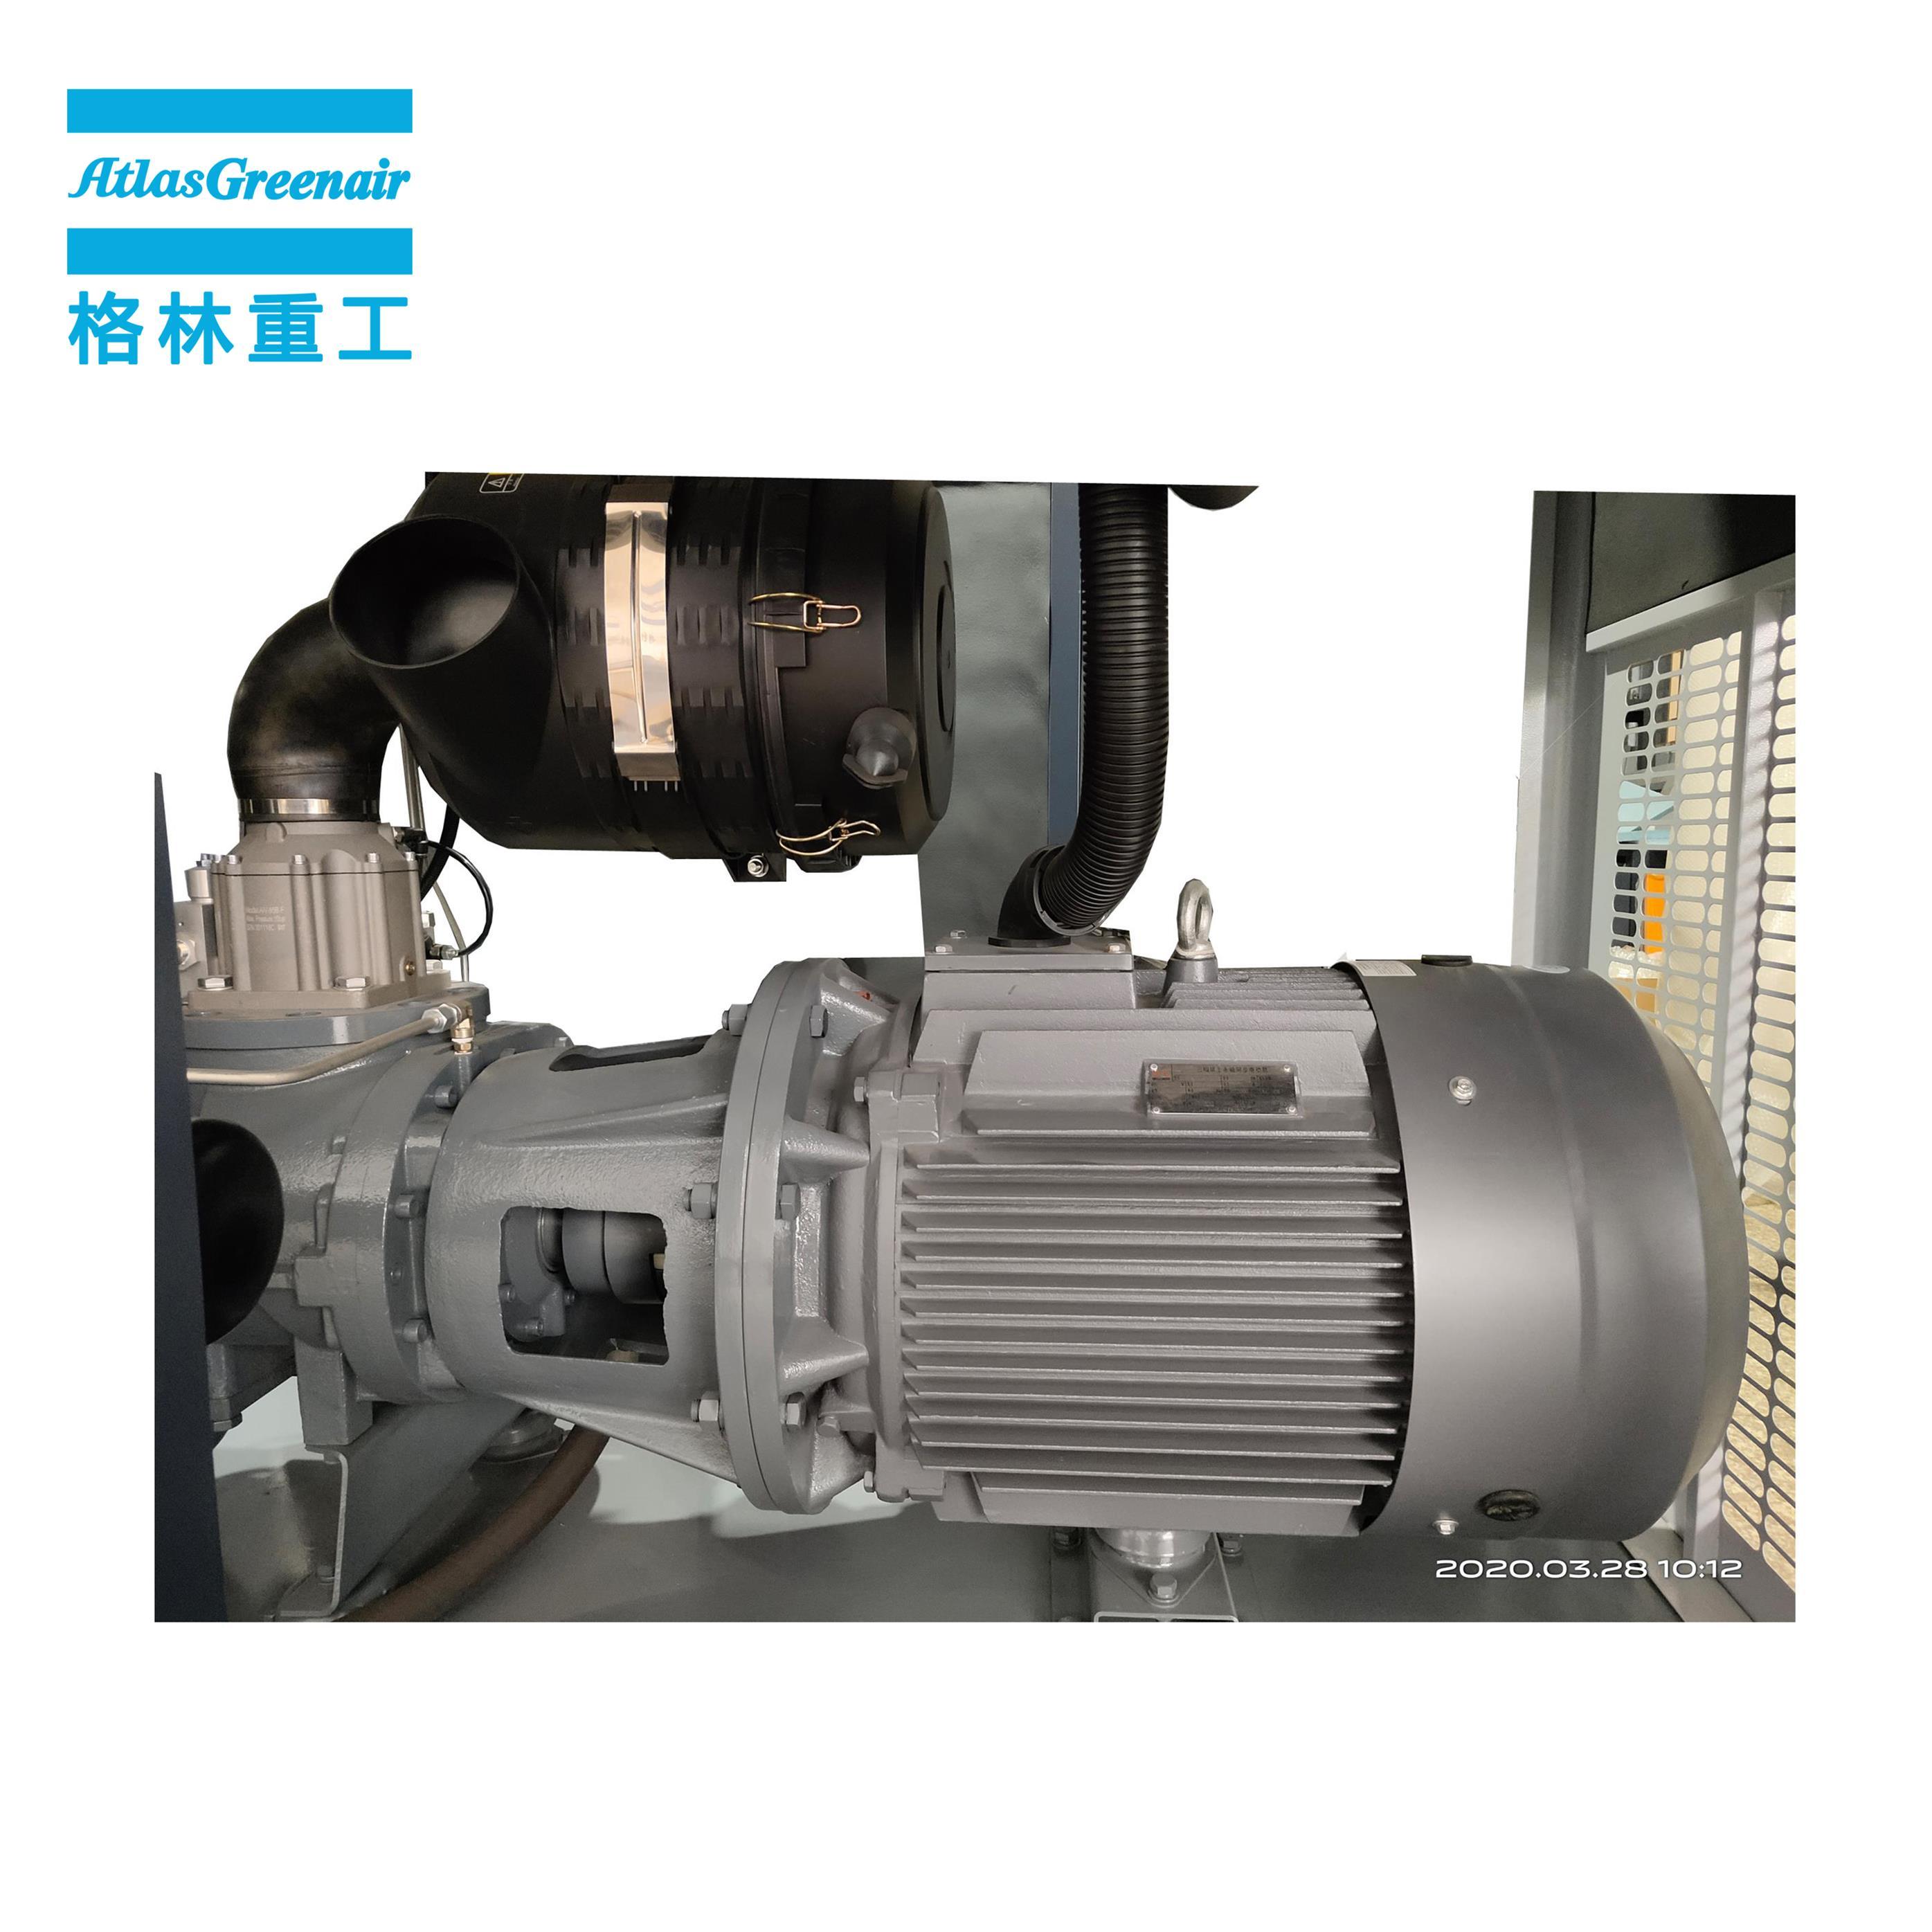 Atlas Greenair Screw Air Compressor new variable speed air compressor factory for sale-2